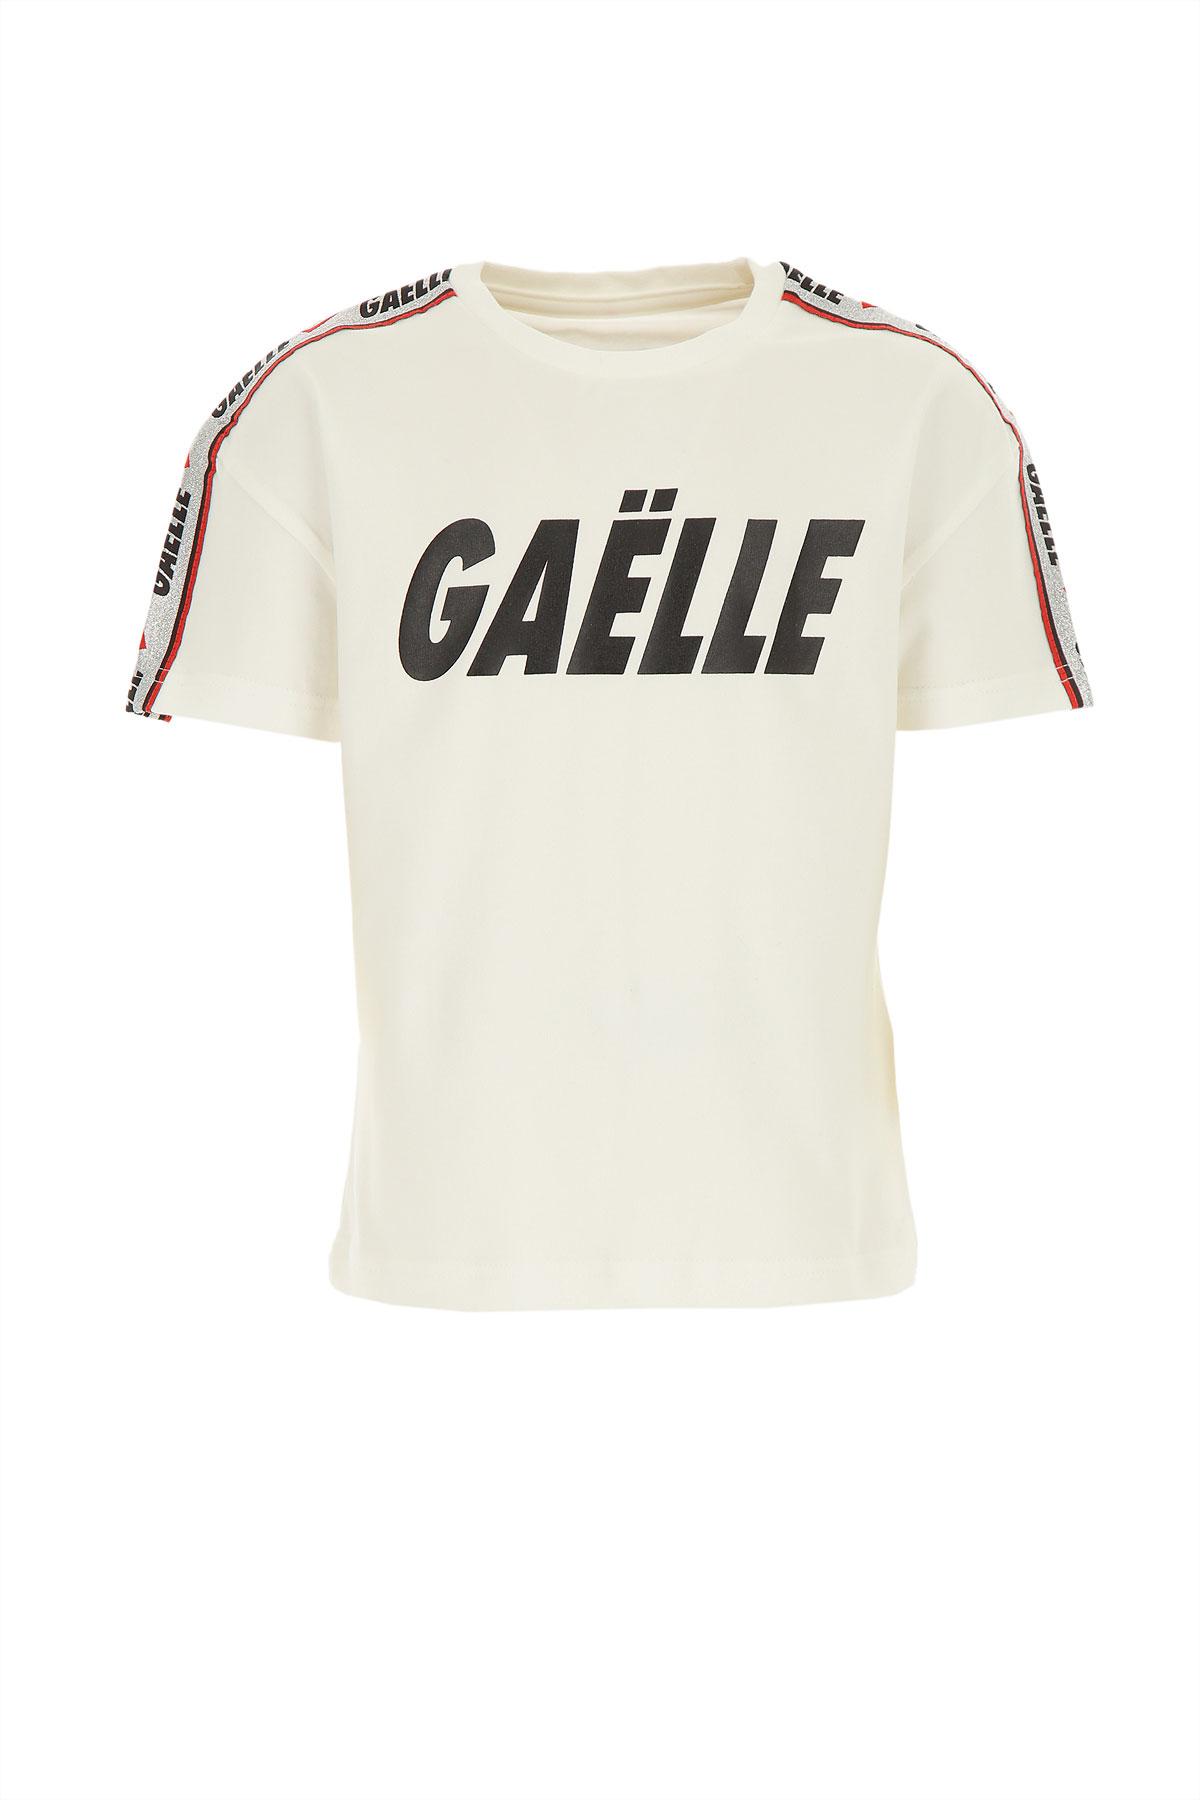 Gaelle Kids T-Shirt for Girls On Sale, White, Cotton, 2019, 12Y 4Y 6Y 8Y